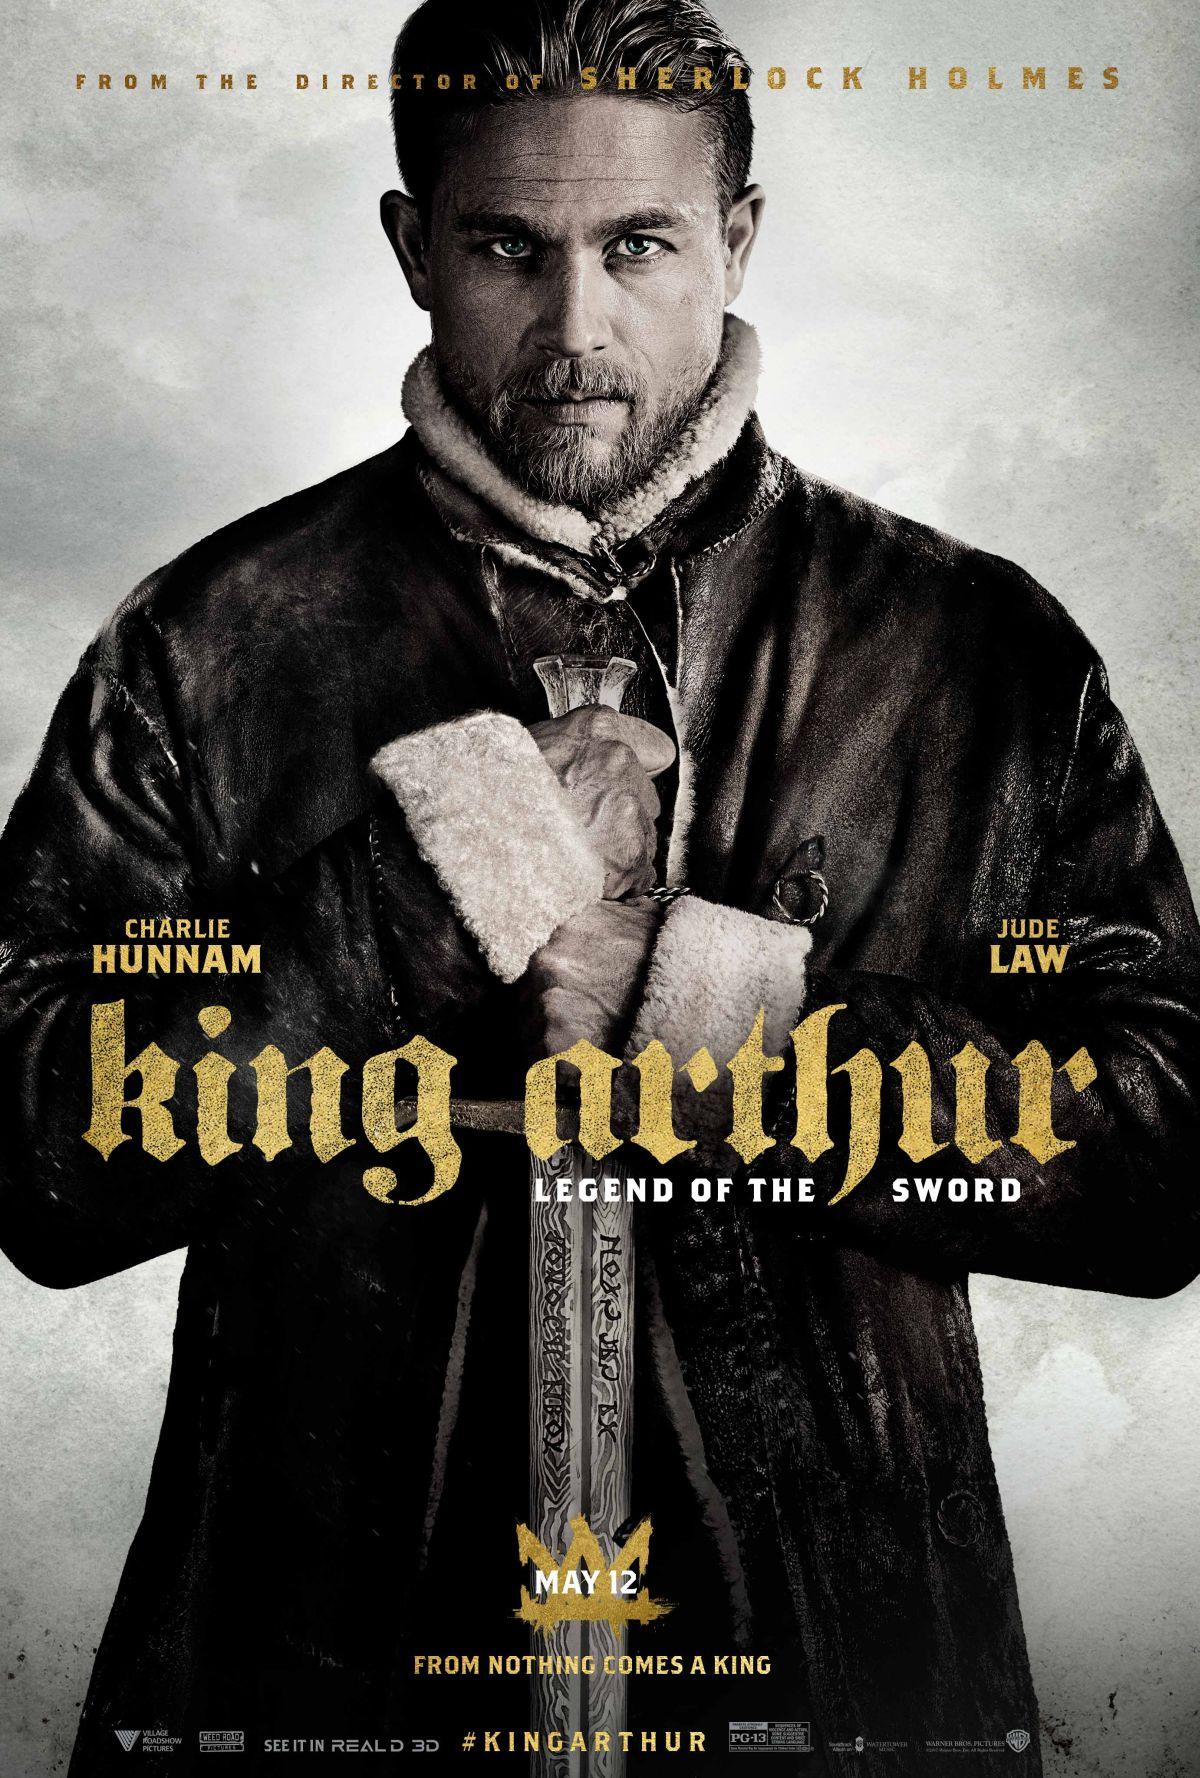 król artur legenda miecza film guy ritchie